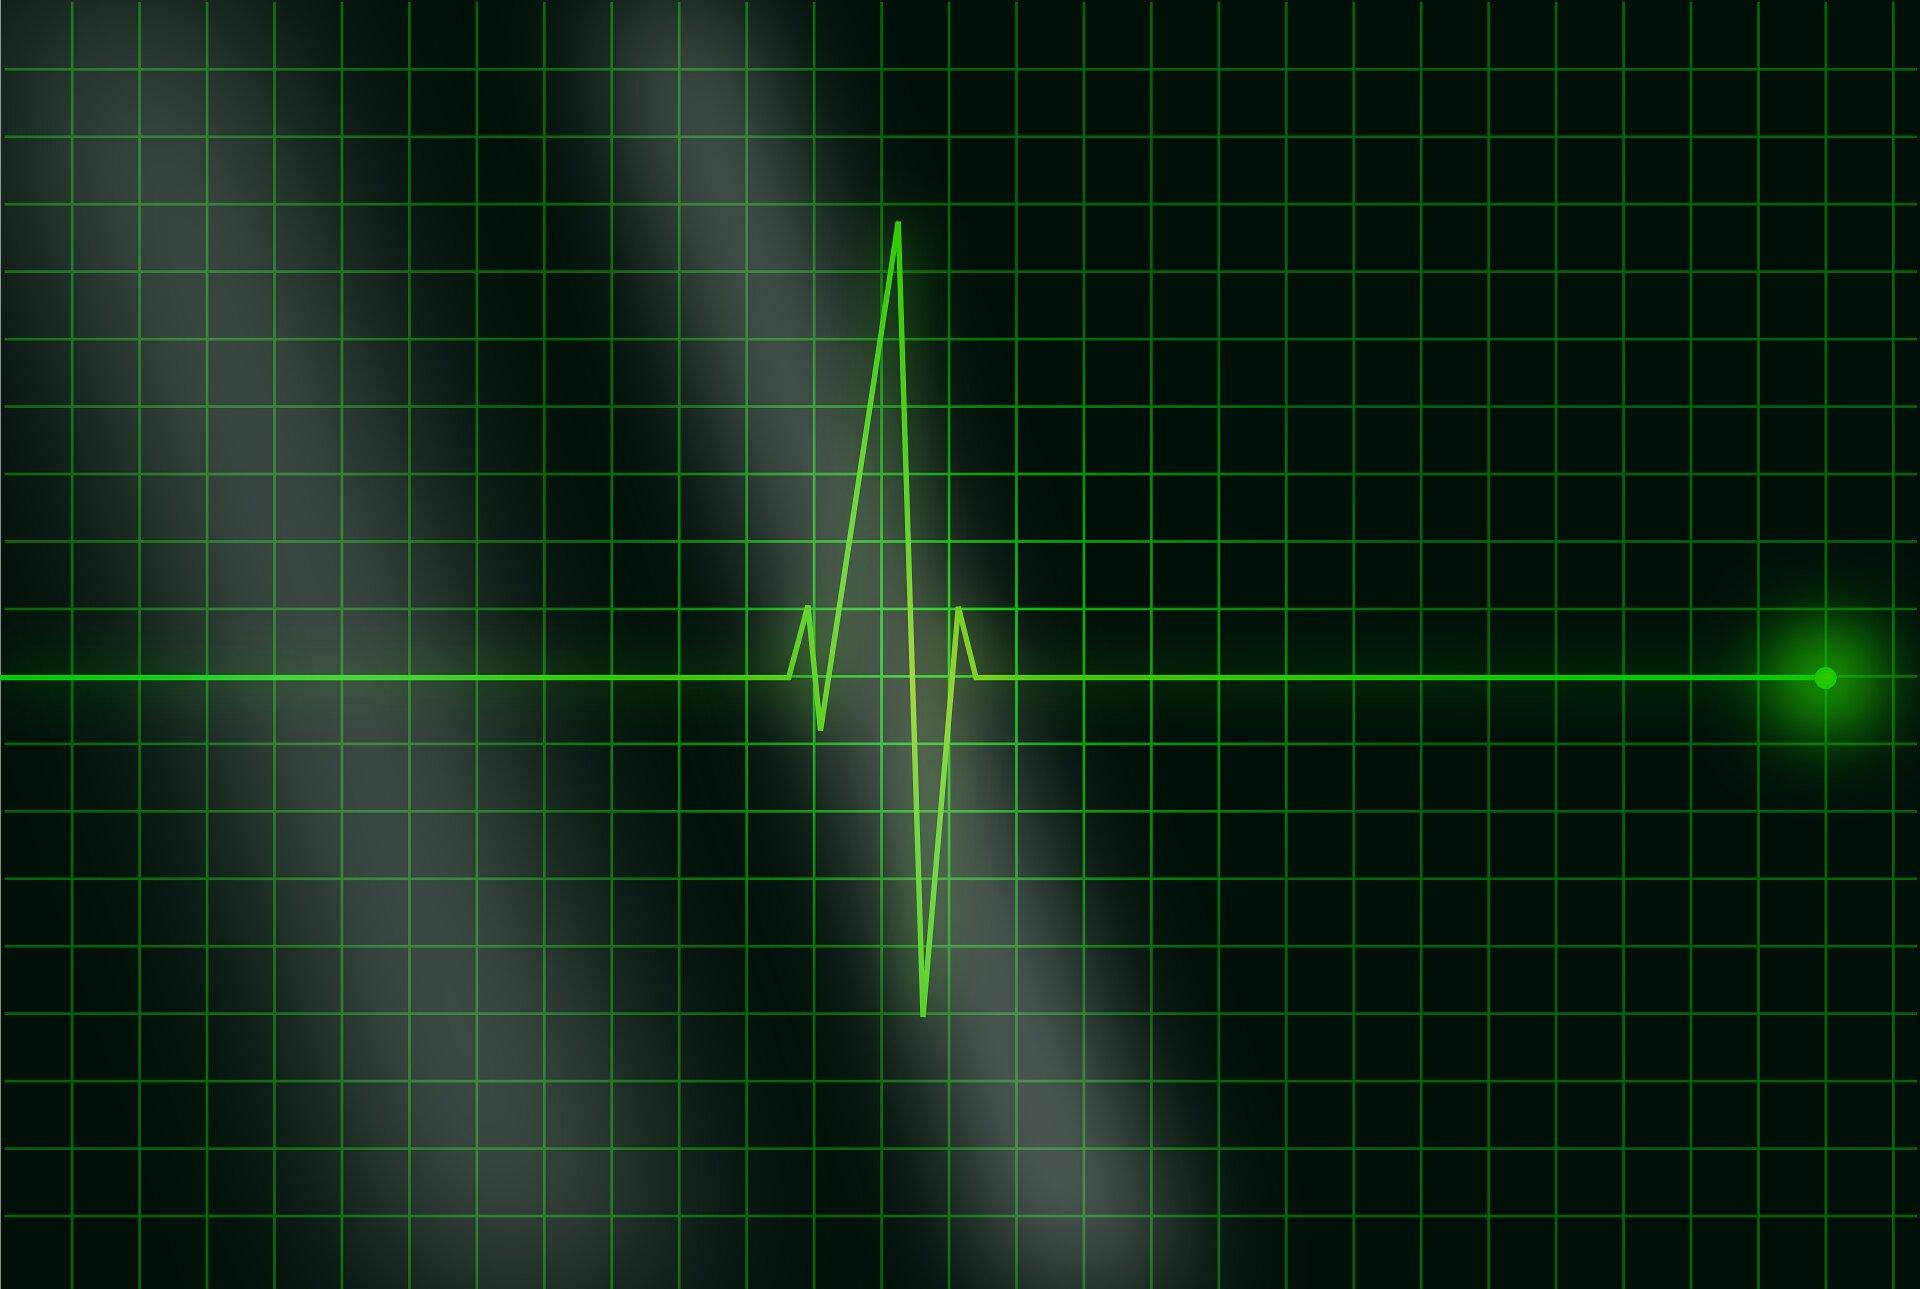 Sleep Apnea Worsens Heart Disease, Yet Often Untreated ...